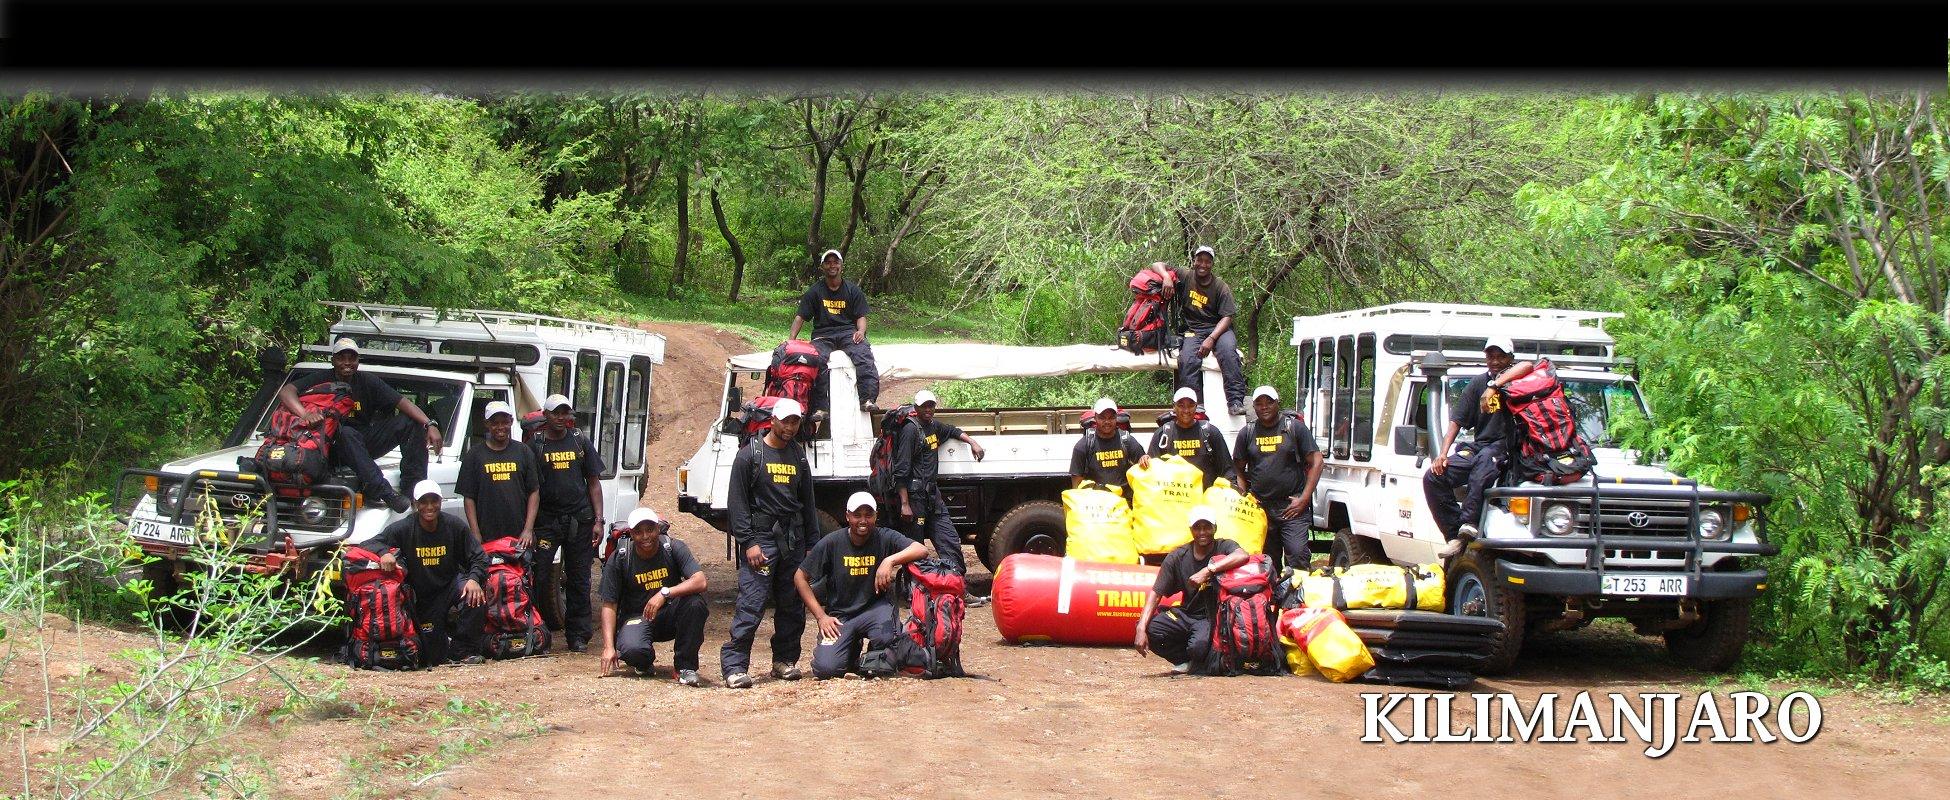 Kilimanjaro World Class Guides